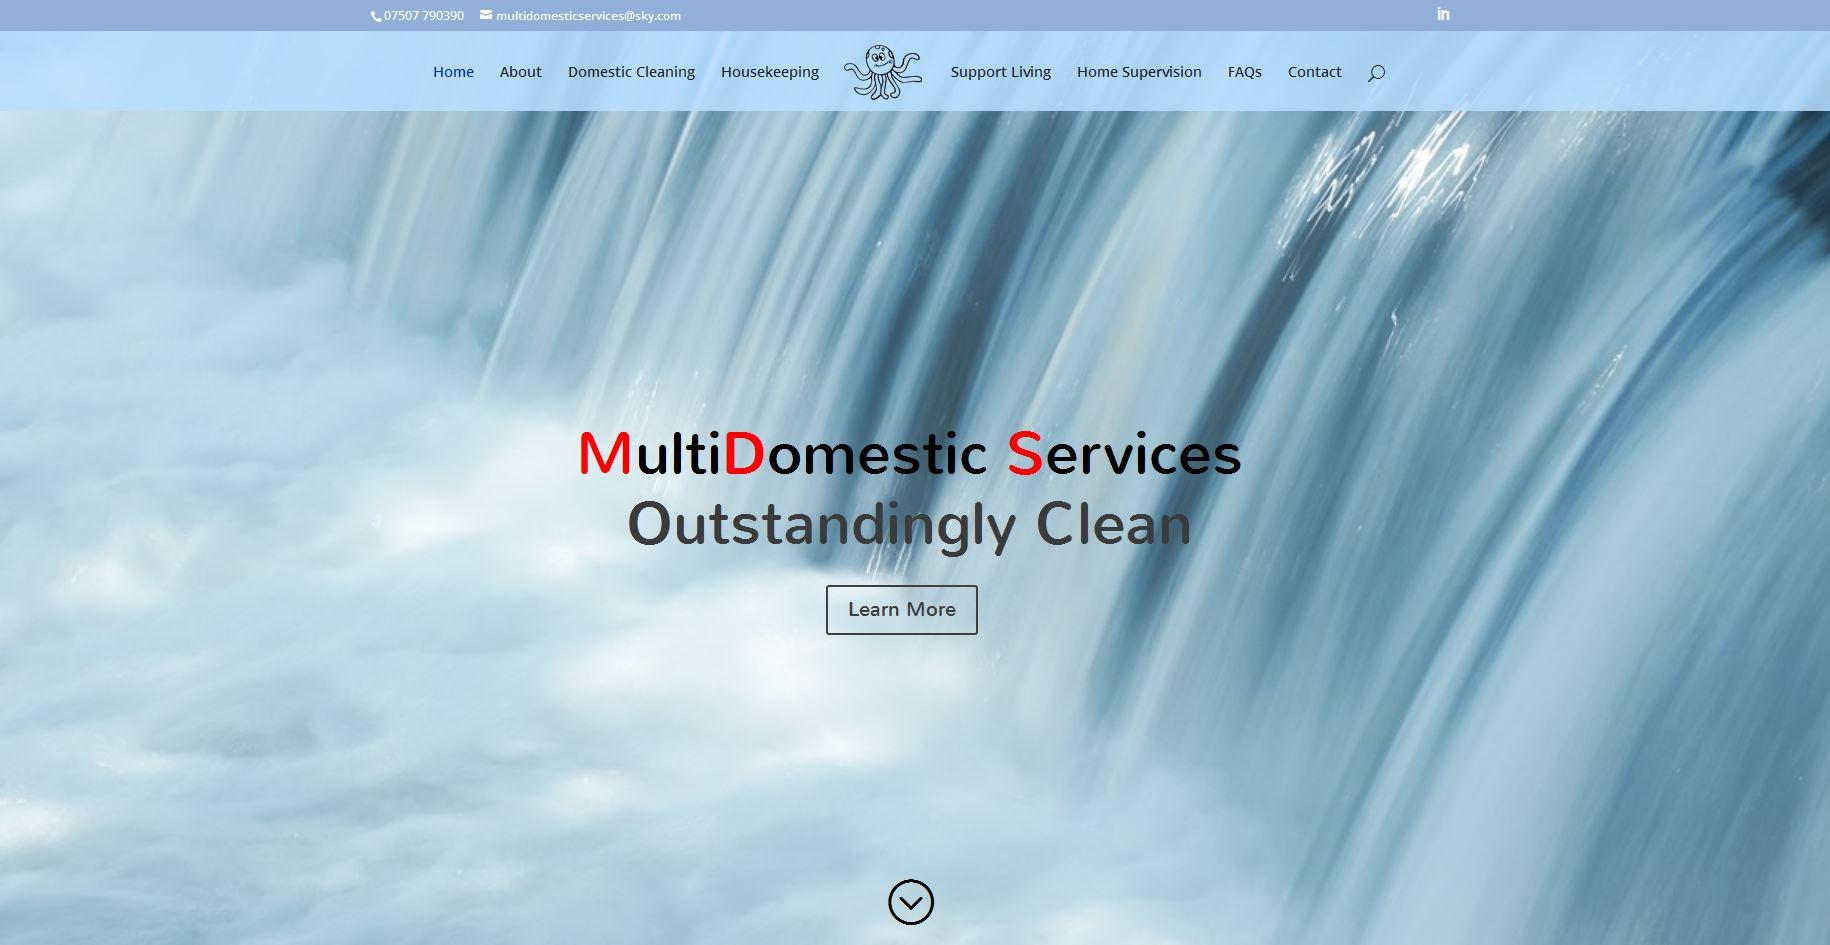 MultiDomestic Services